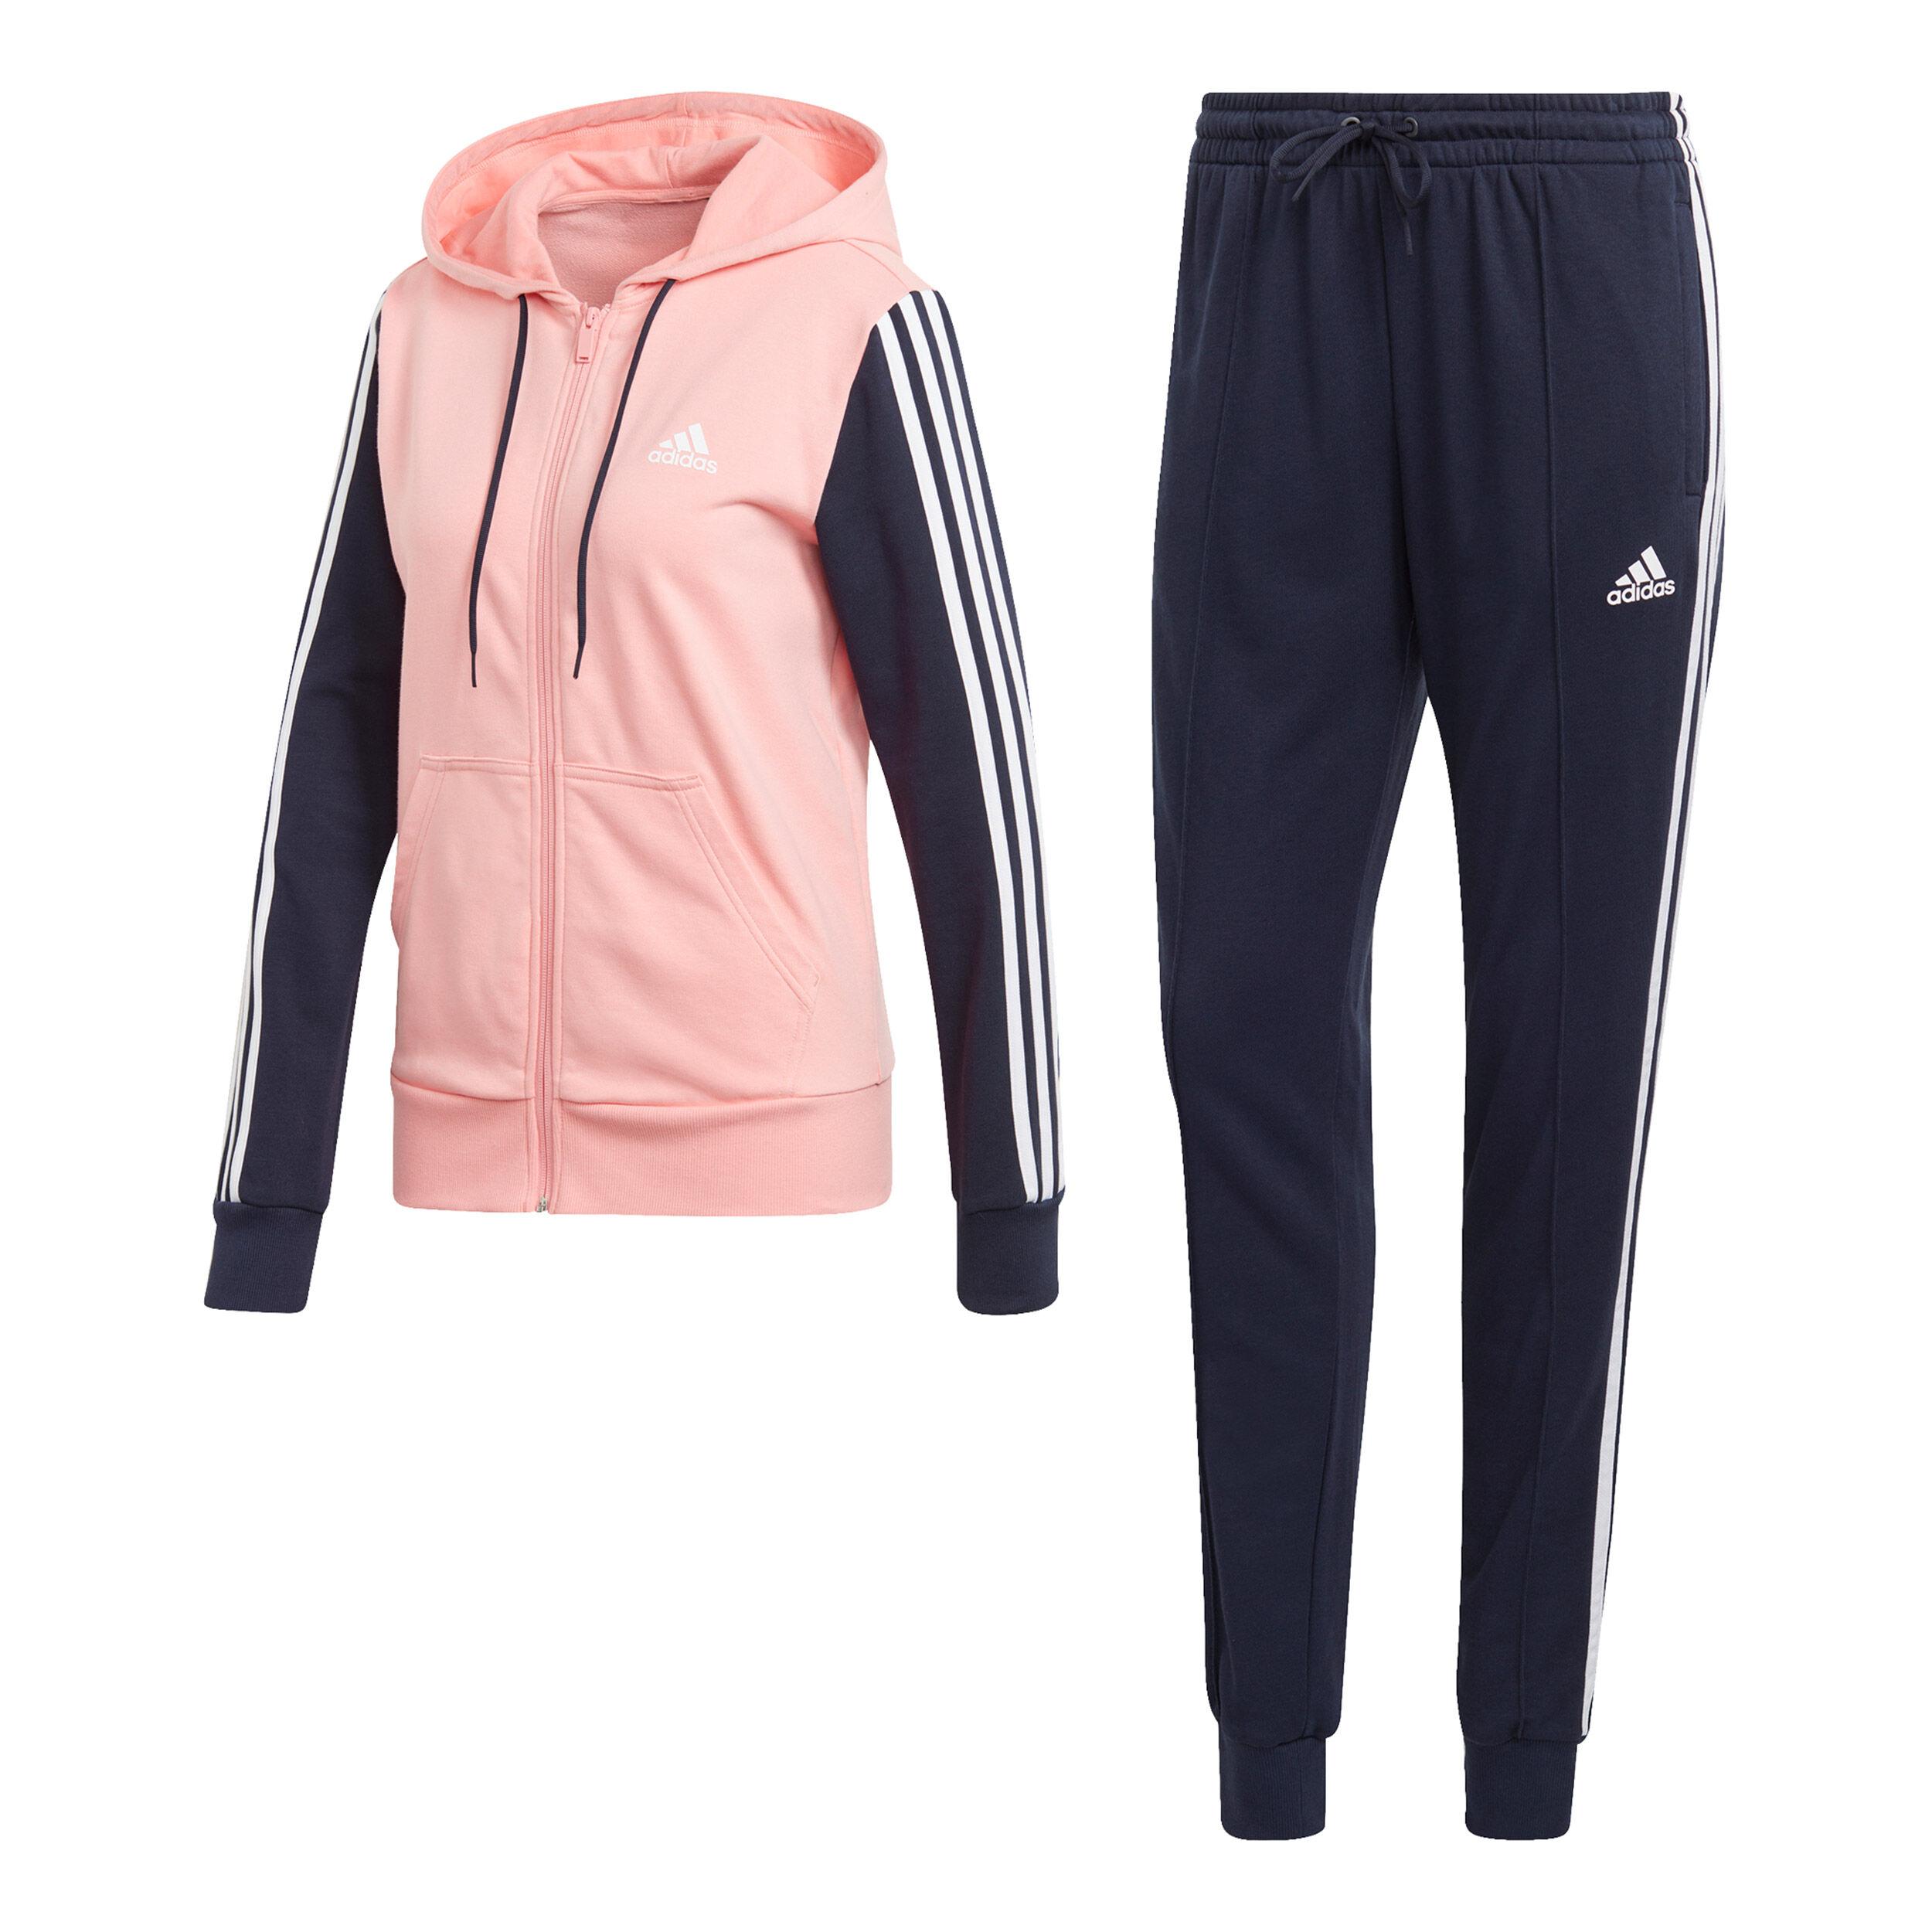 adidas Energize Trainingsanzug Damen - Rosa, Dunkelblau ...